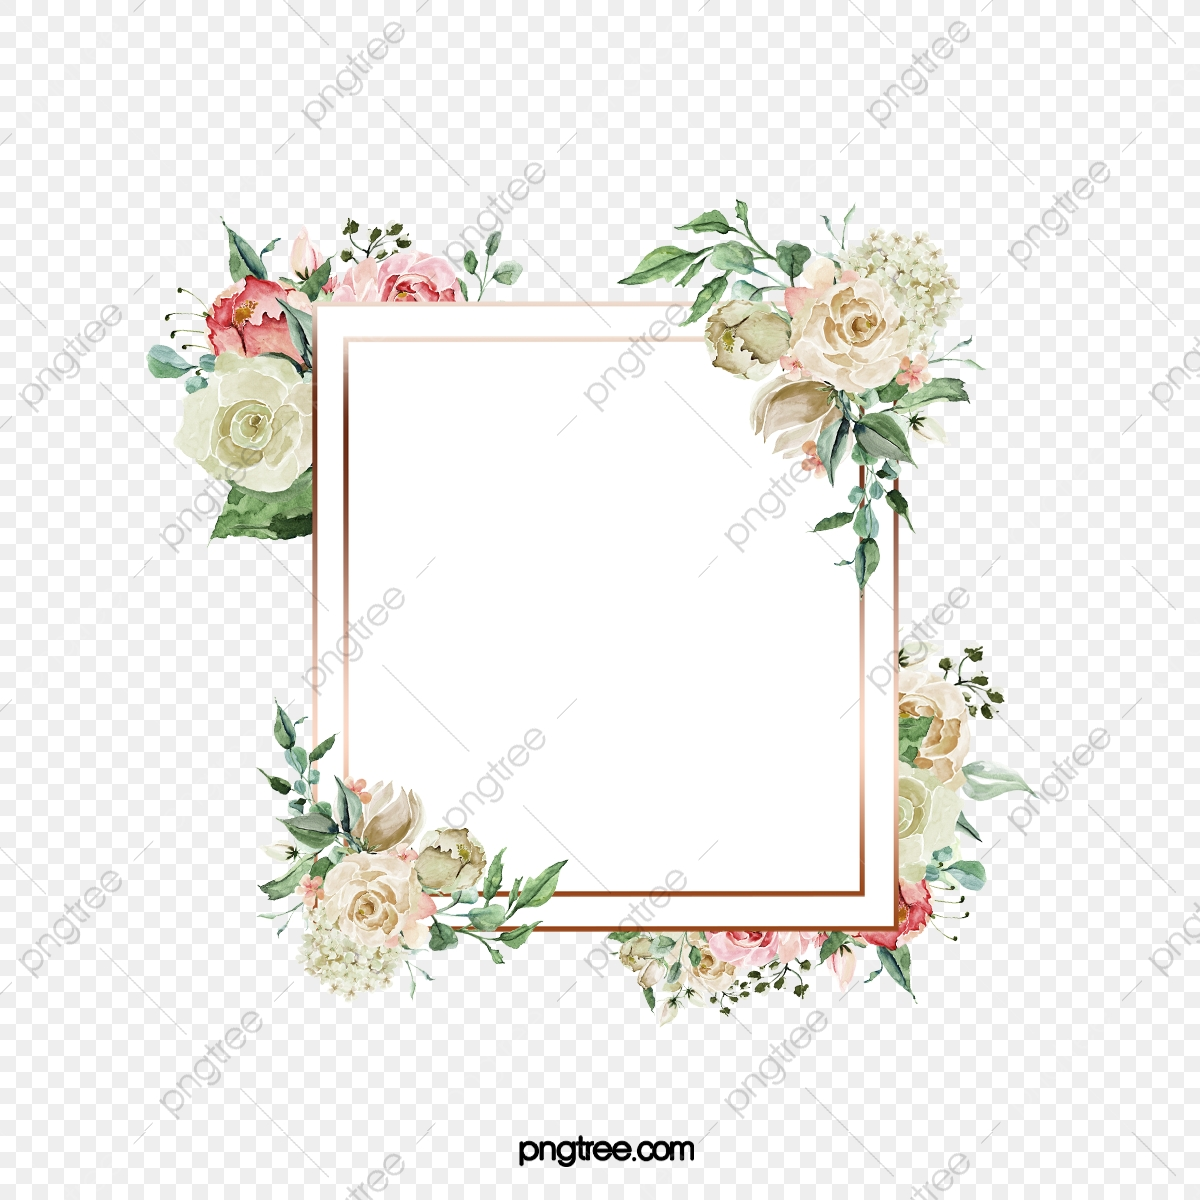 Peinture Fleurs Mariage Invitation Bordure Pale Le Mariage